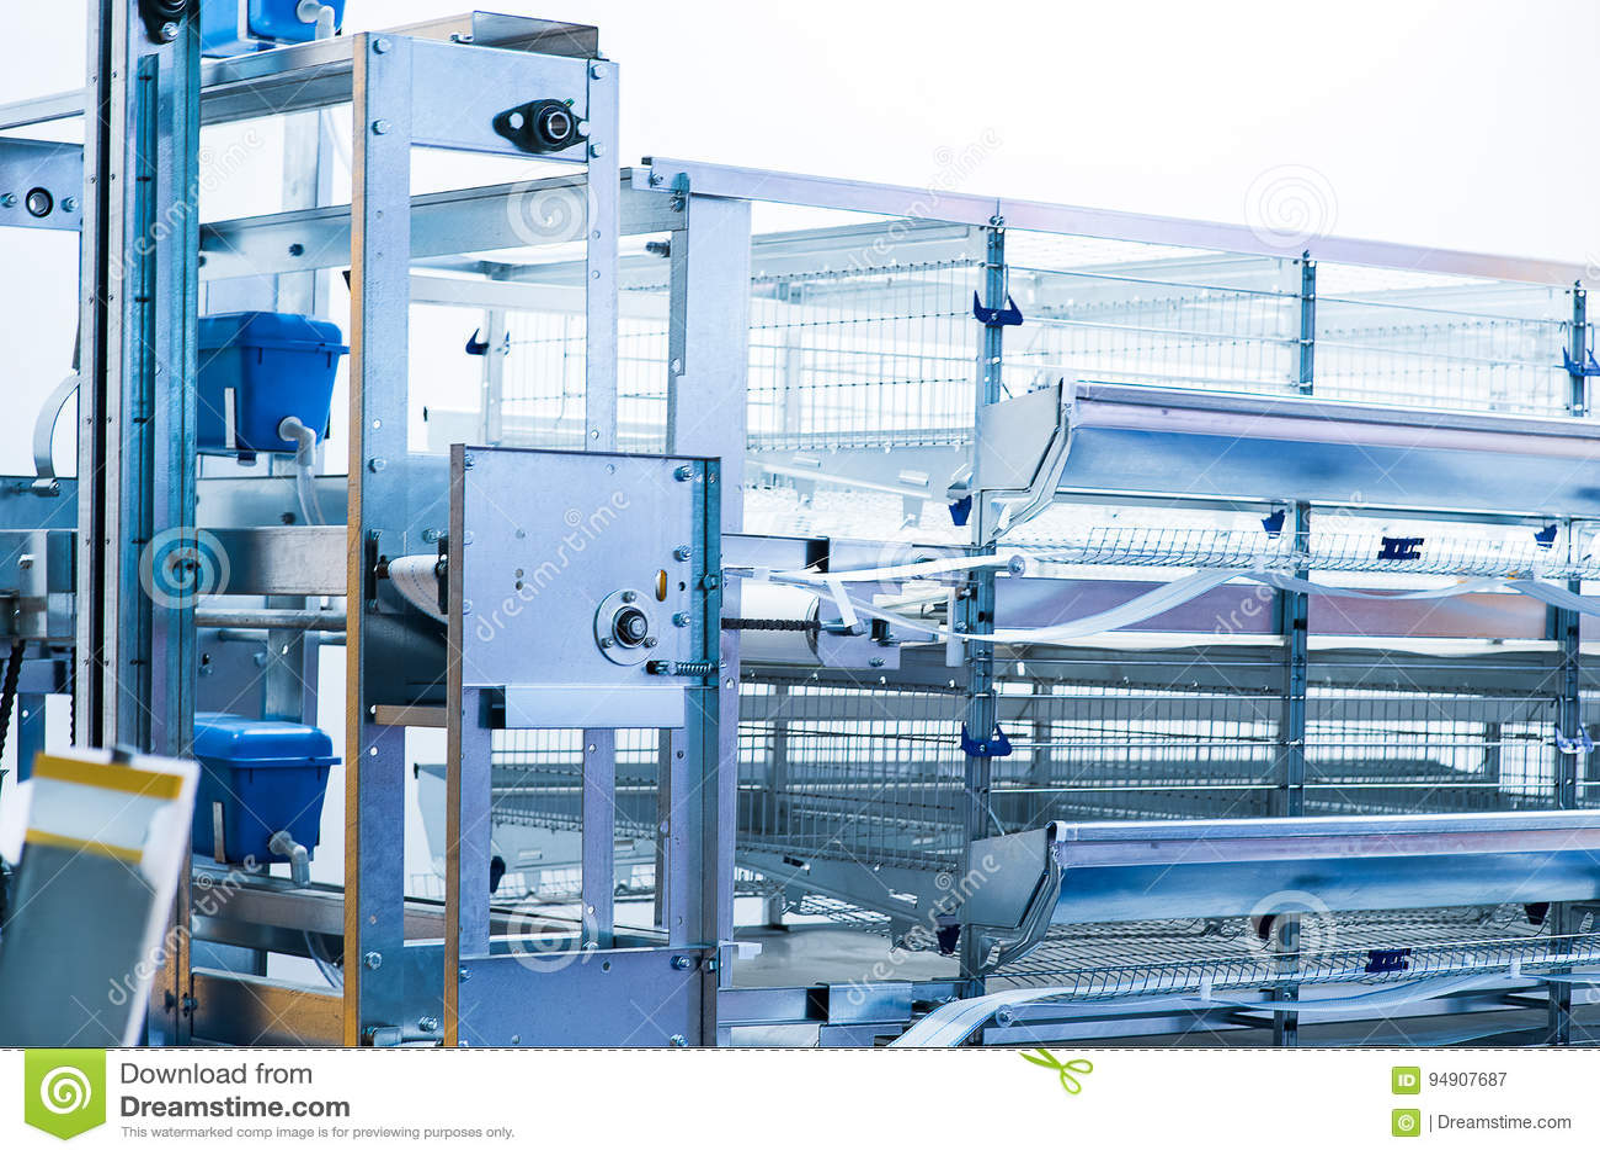 Eggs production incubator inside